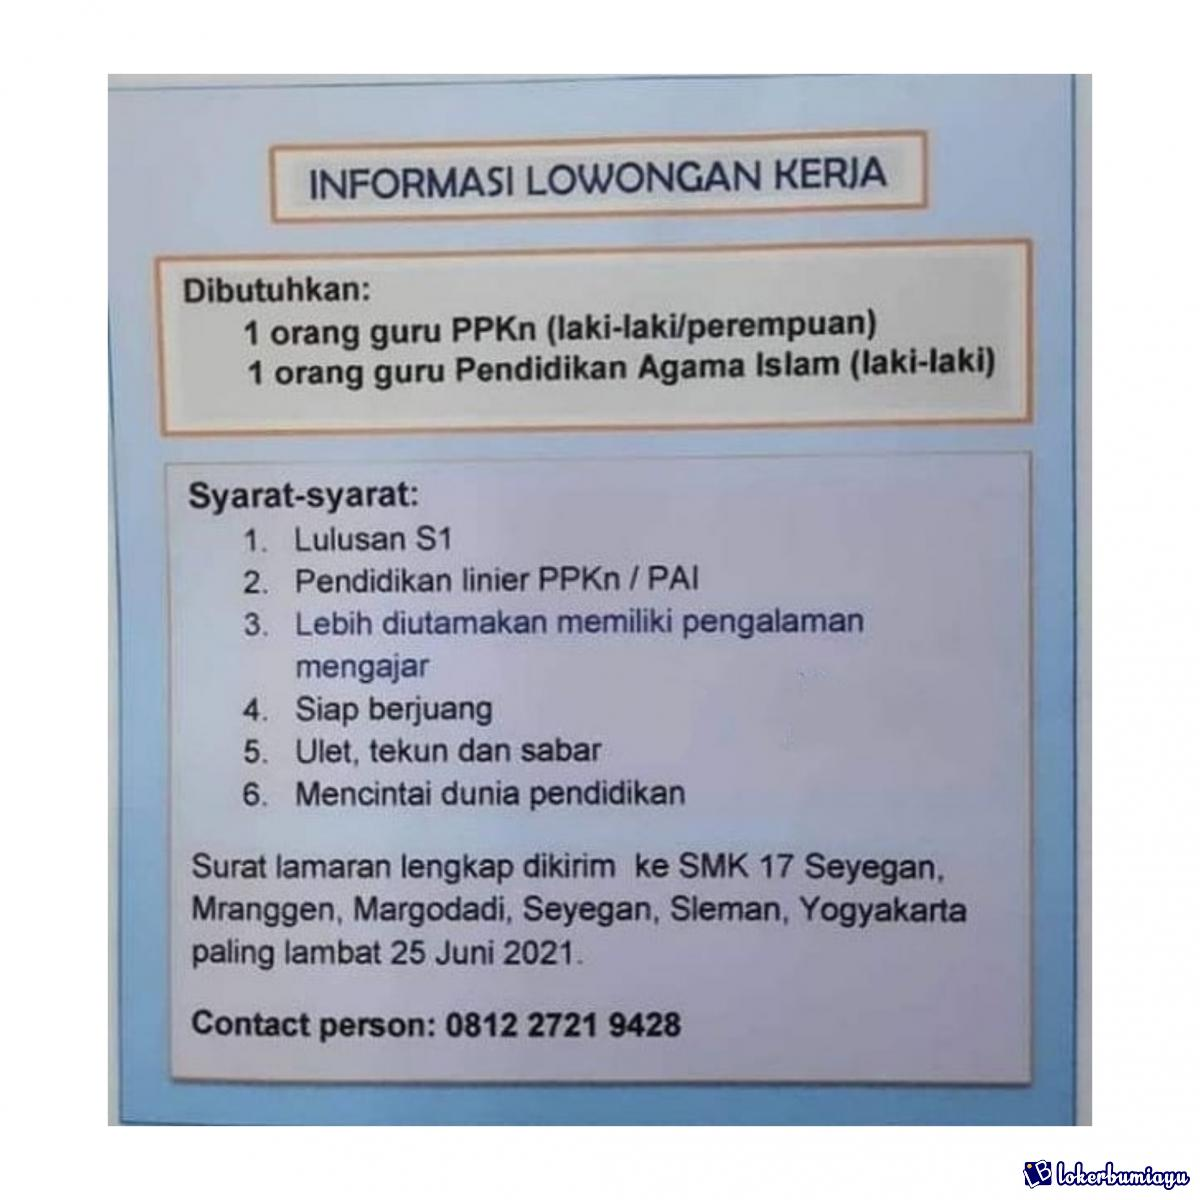 Lowongan Kerja Di Prov Di Yogyakarta Juni 2021